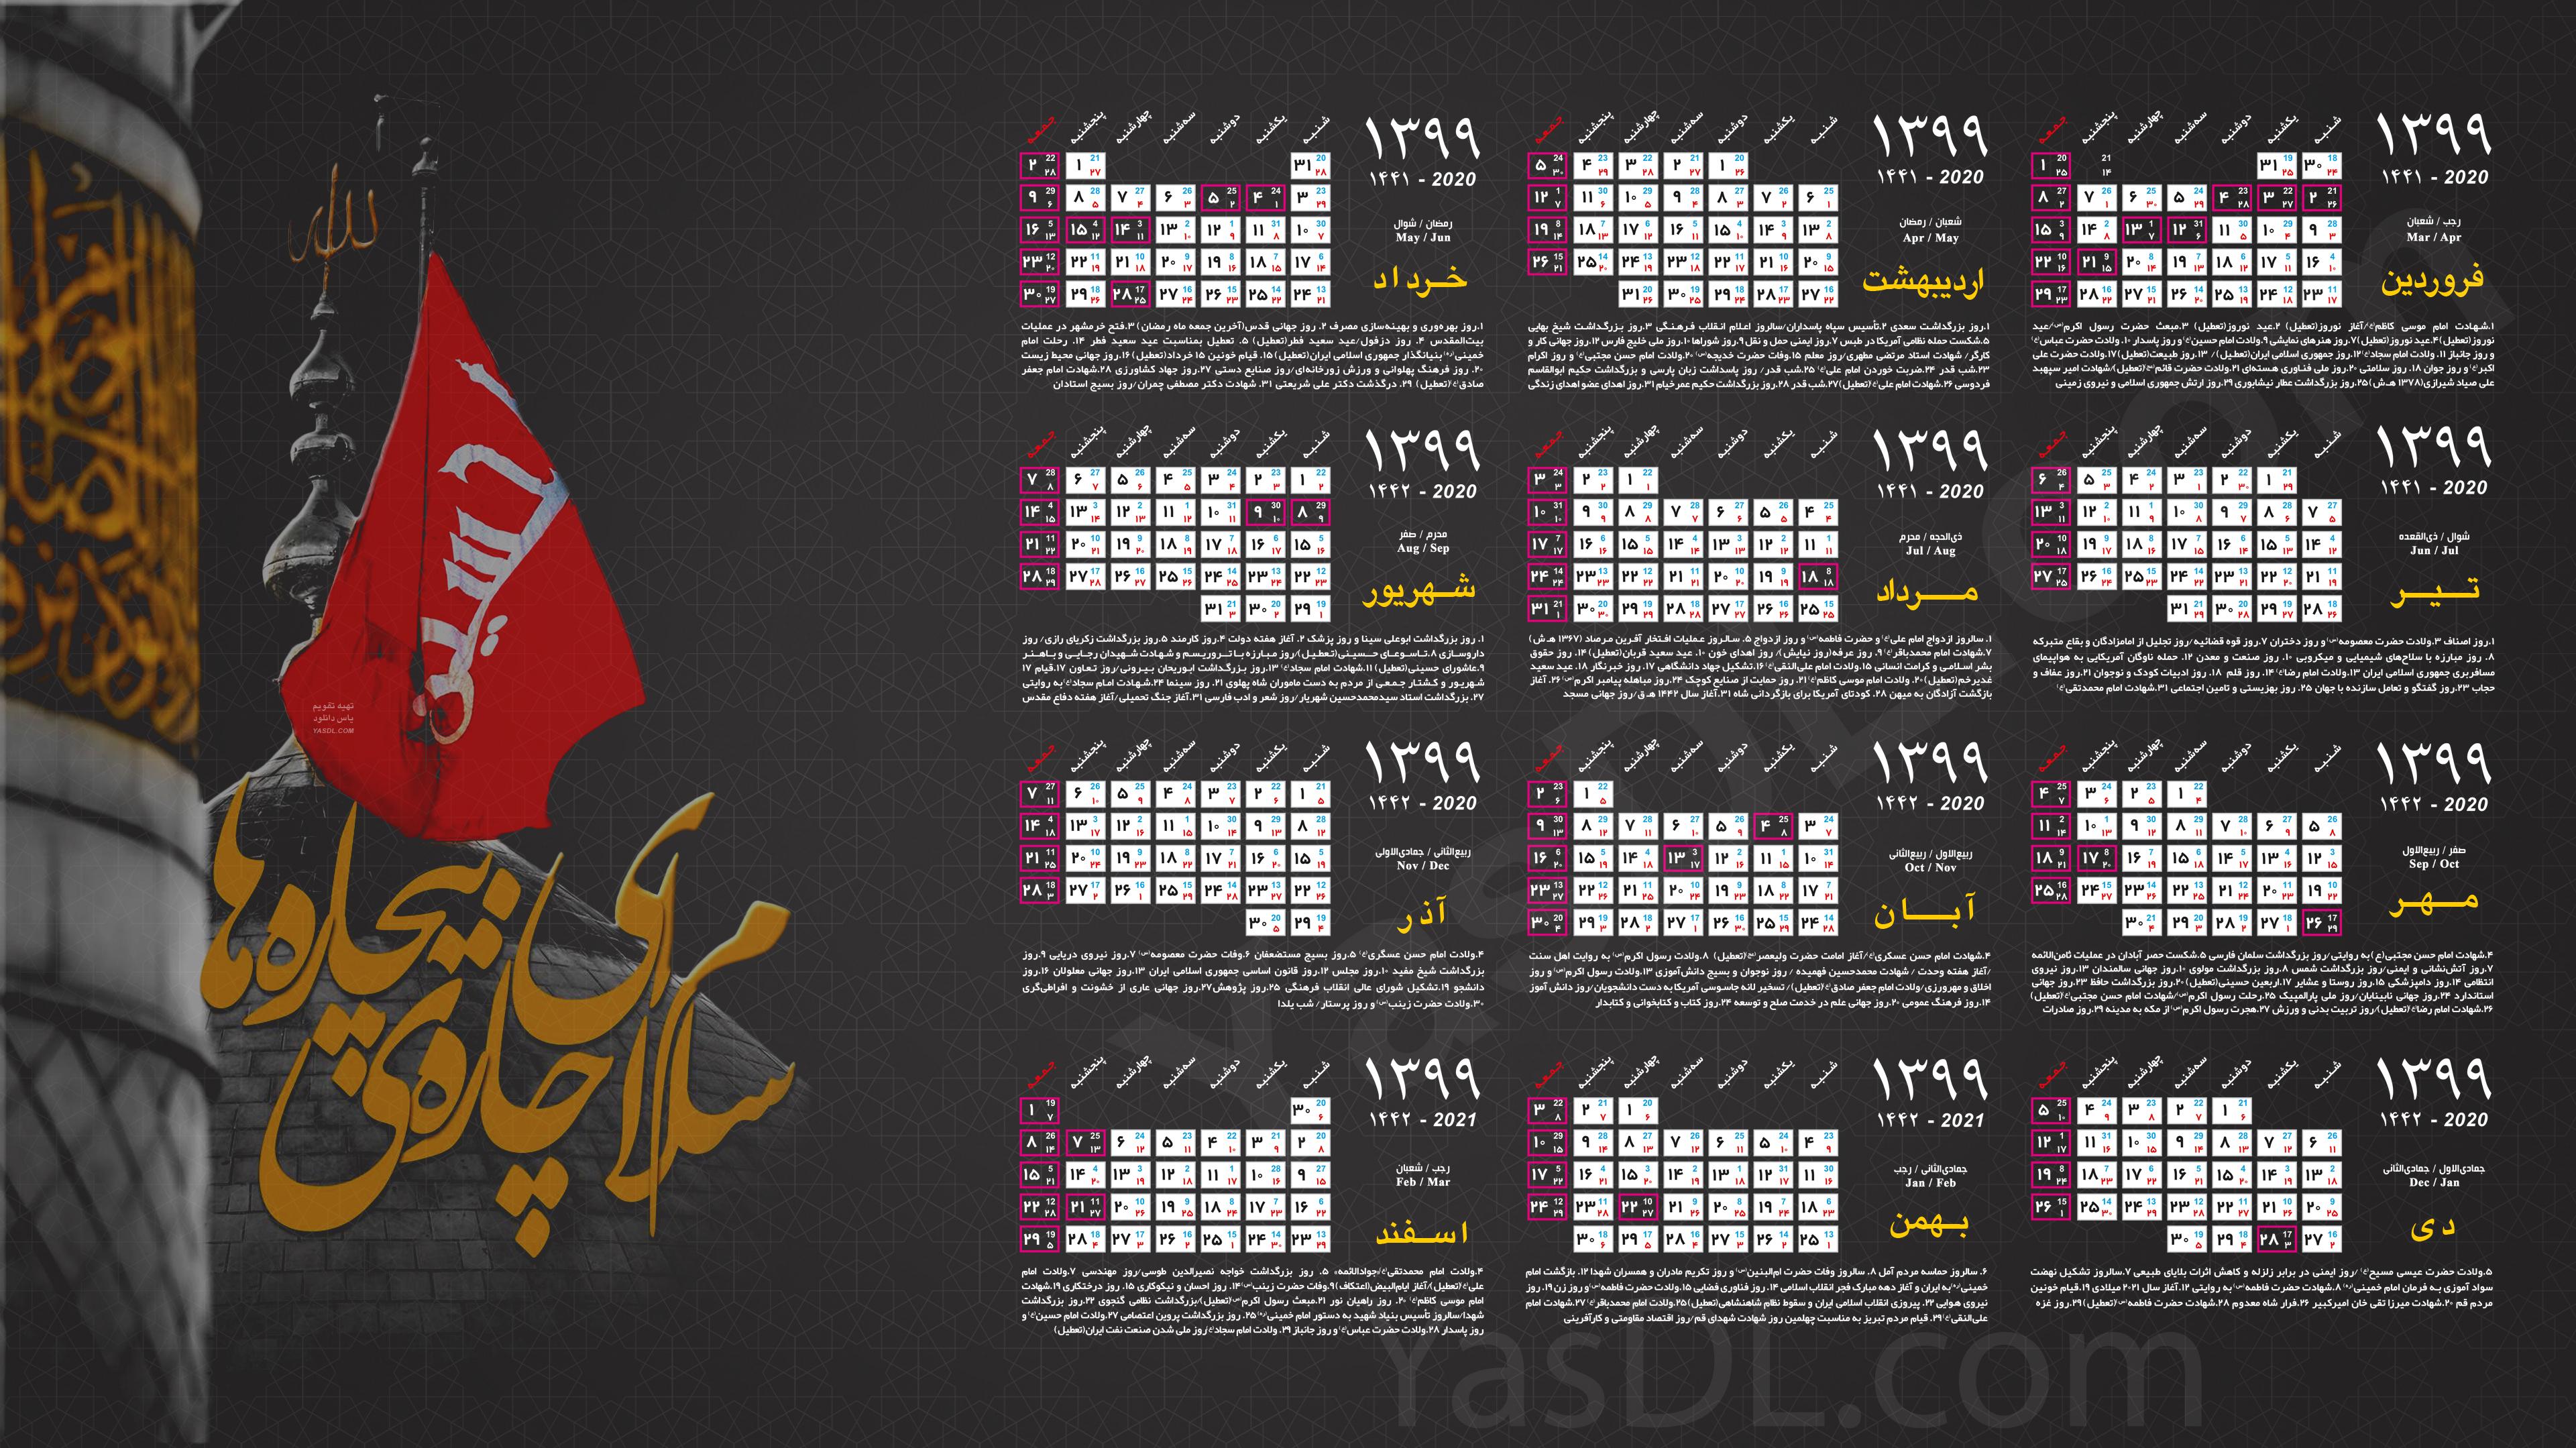 https://www.yasdl.com/wp-content/uploads/2019/11/Calendar-1399-one-view.jpg?w4tg